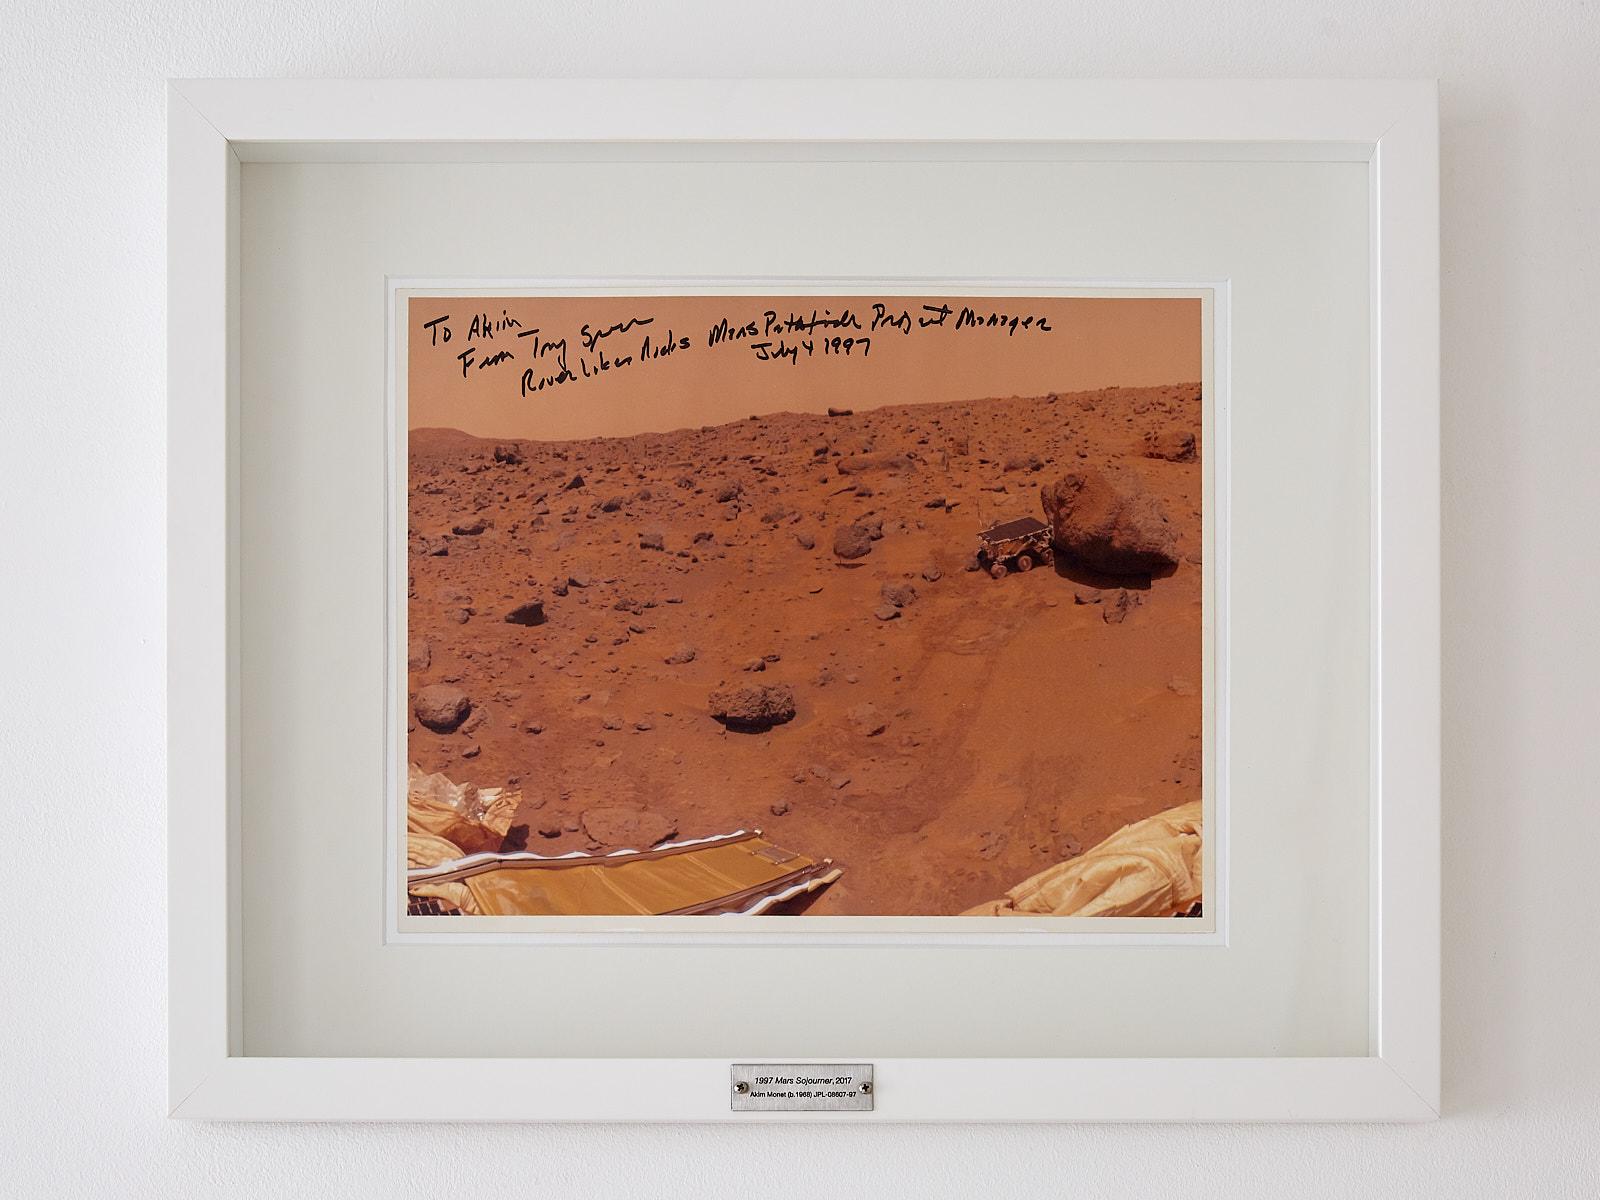 07-Akim-MONET-1997-Mars-Sojourner